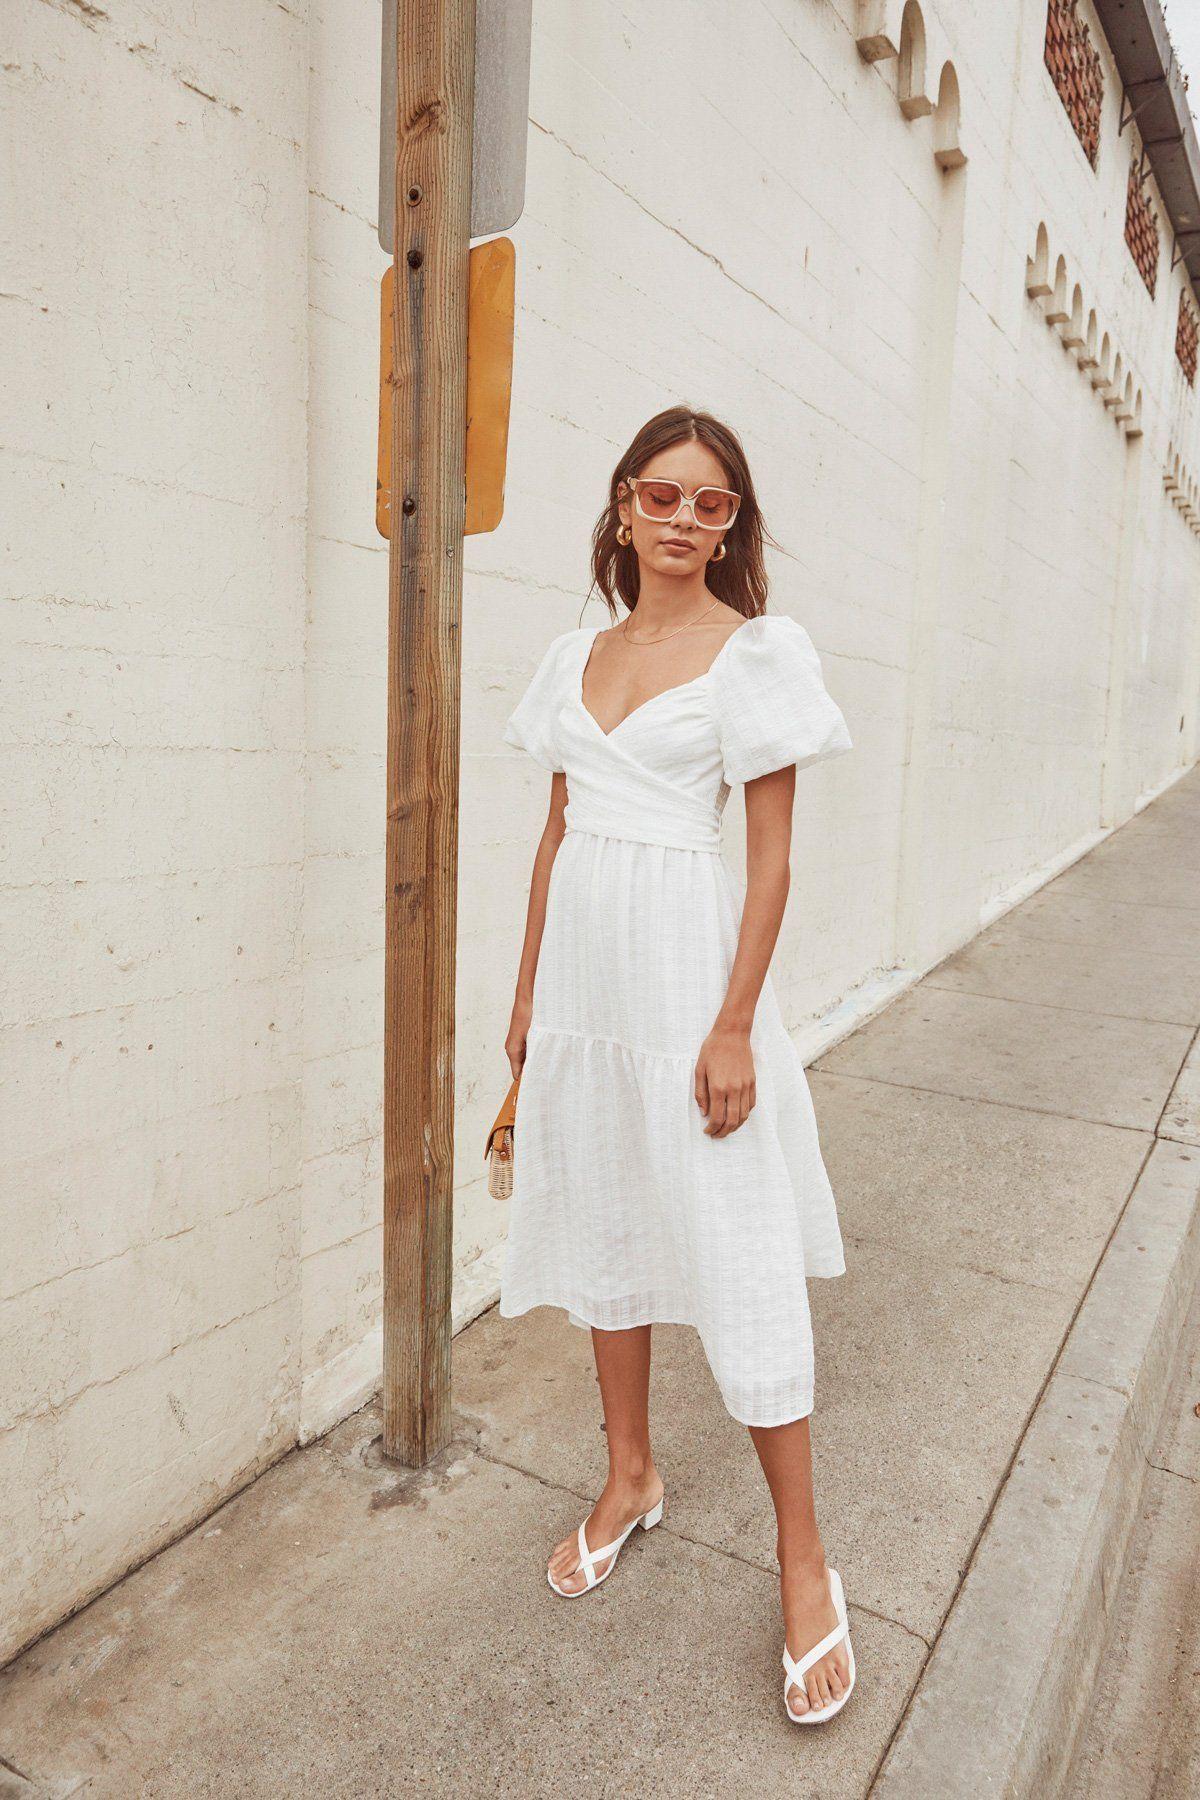 Sonnet Puff Sleeve Midi Dress Astr The Label Puff Sleeve Midi Dresses White Midi Dress Puff Sleeve Dresses [ 1800 x 1200 Pixel ]